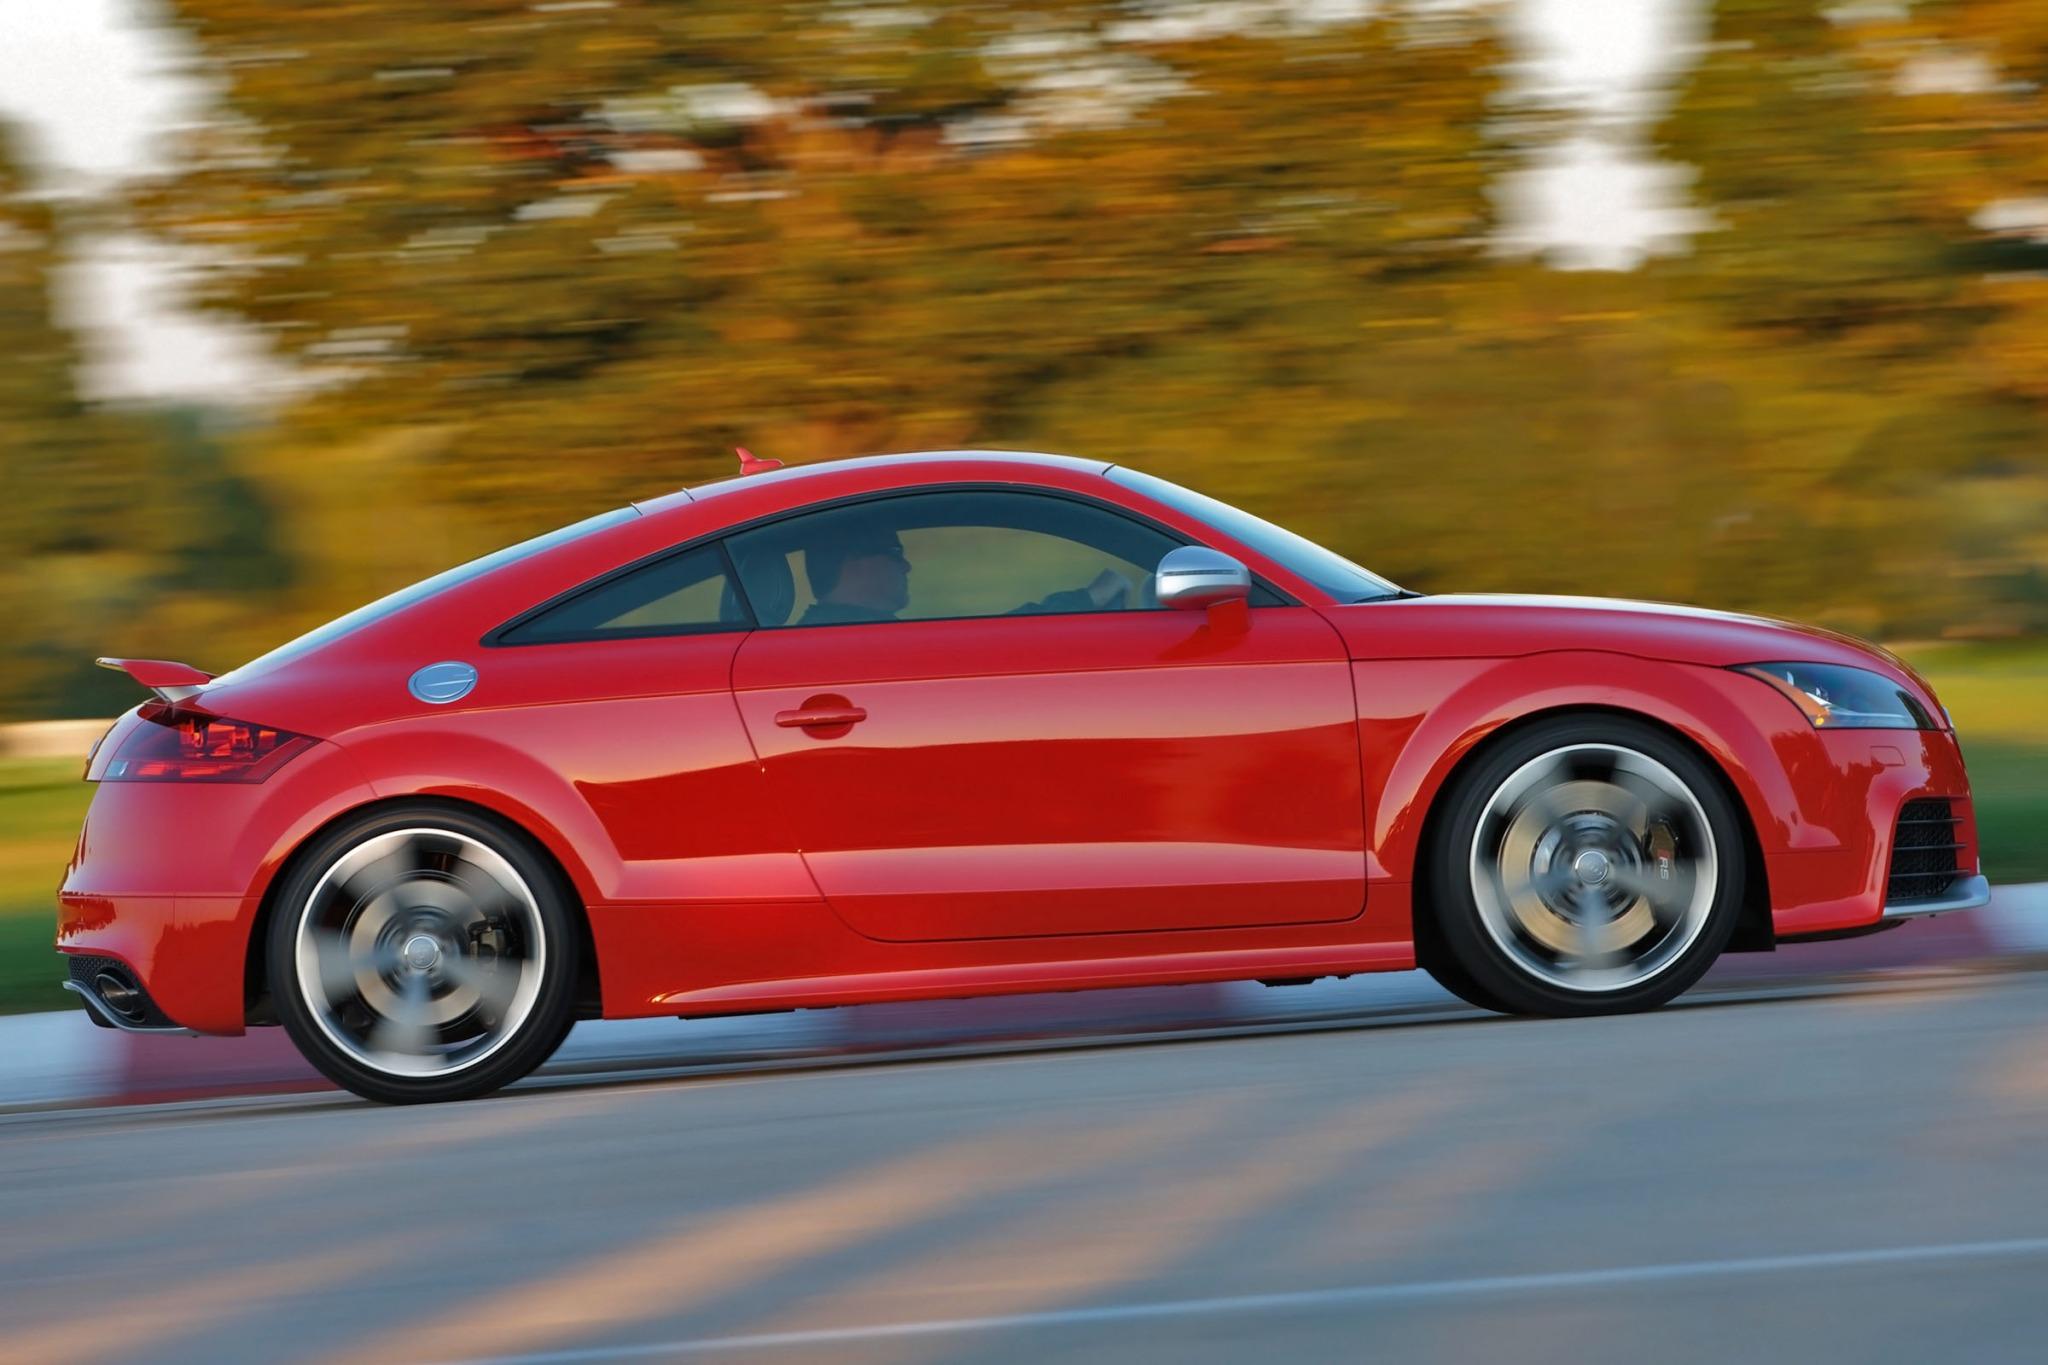 2013 Audi Tt Rs Image 7